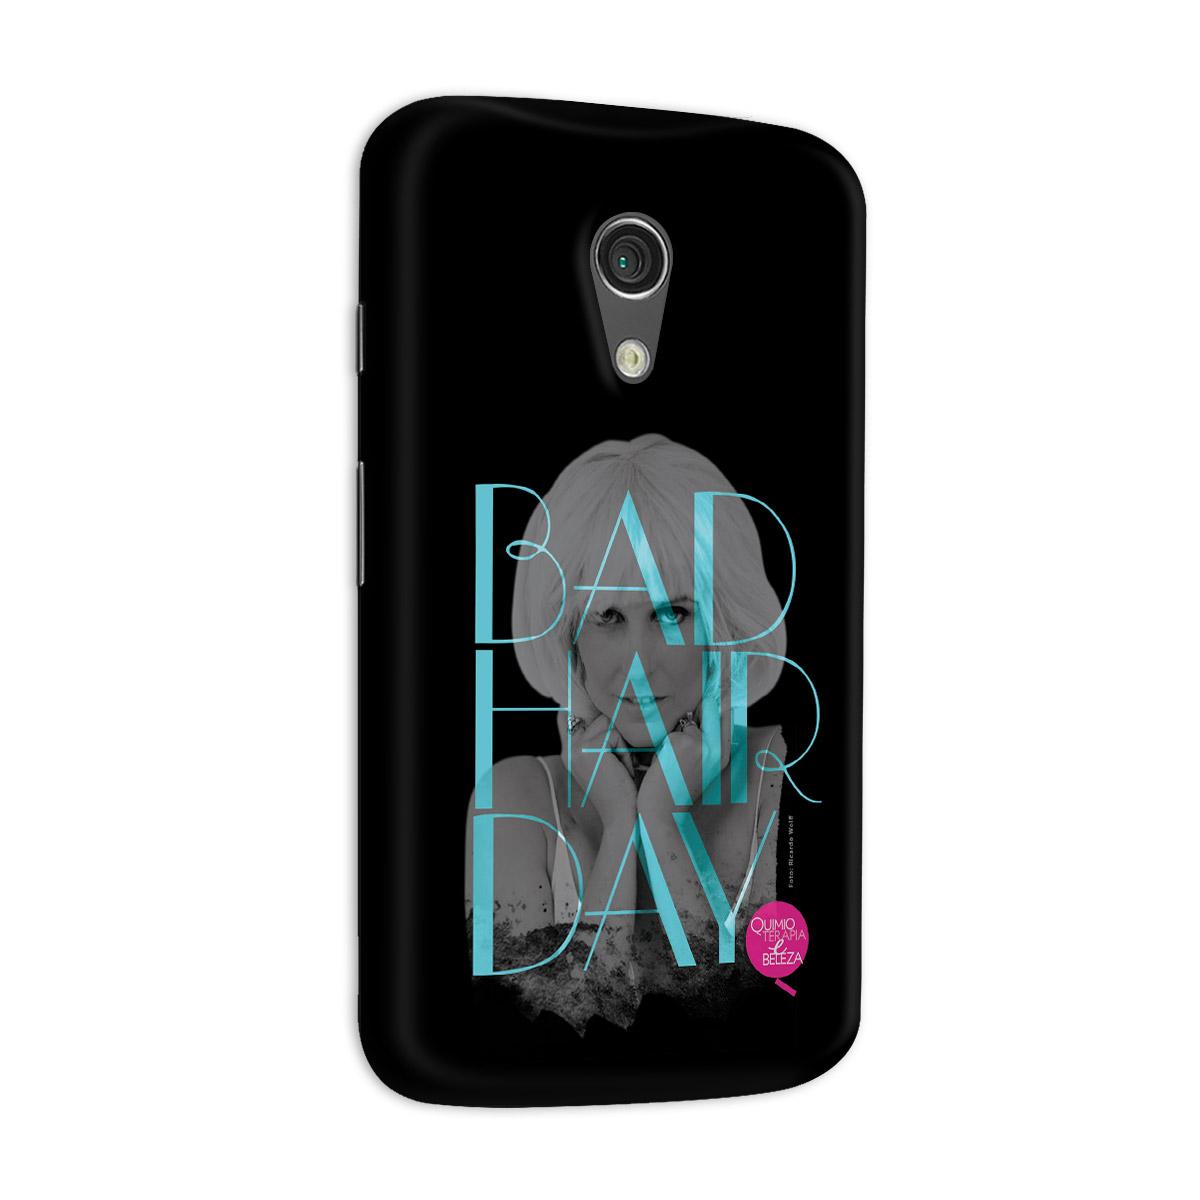 Capa para Motorola Moto G 2 QeB Bad Hair Day